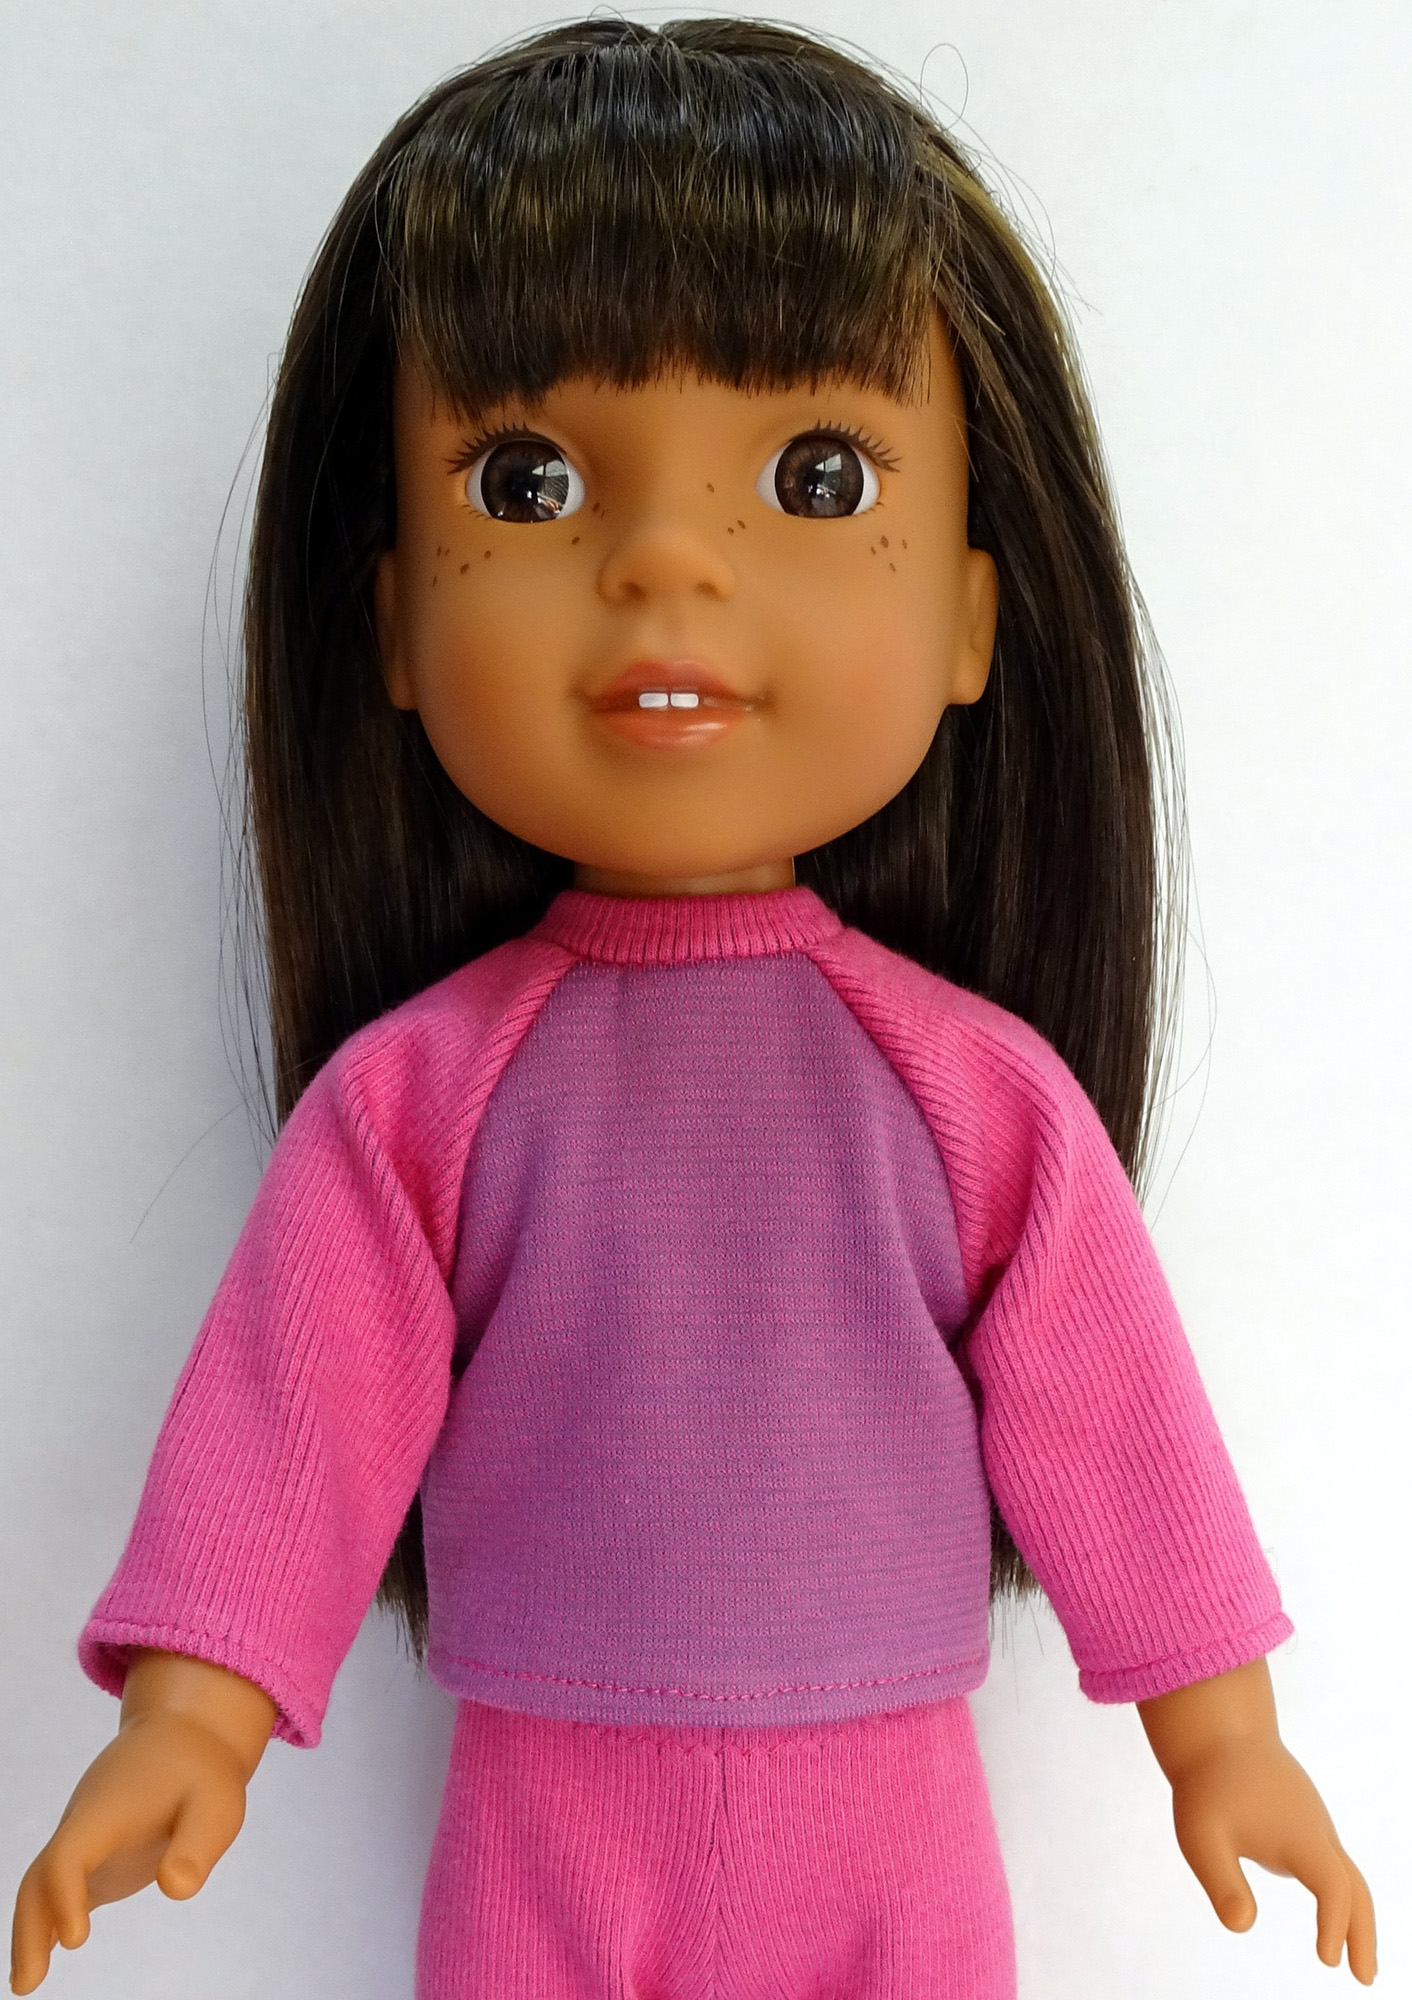 t-shirt pattern Wellie Wishers Doll